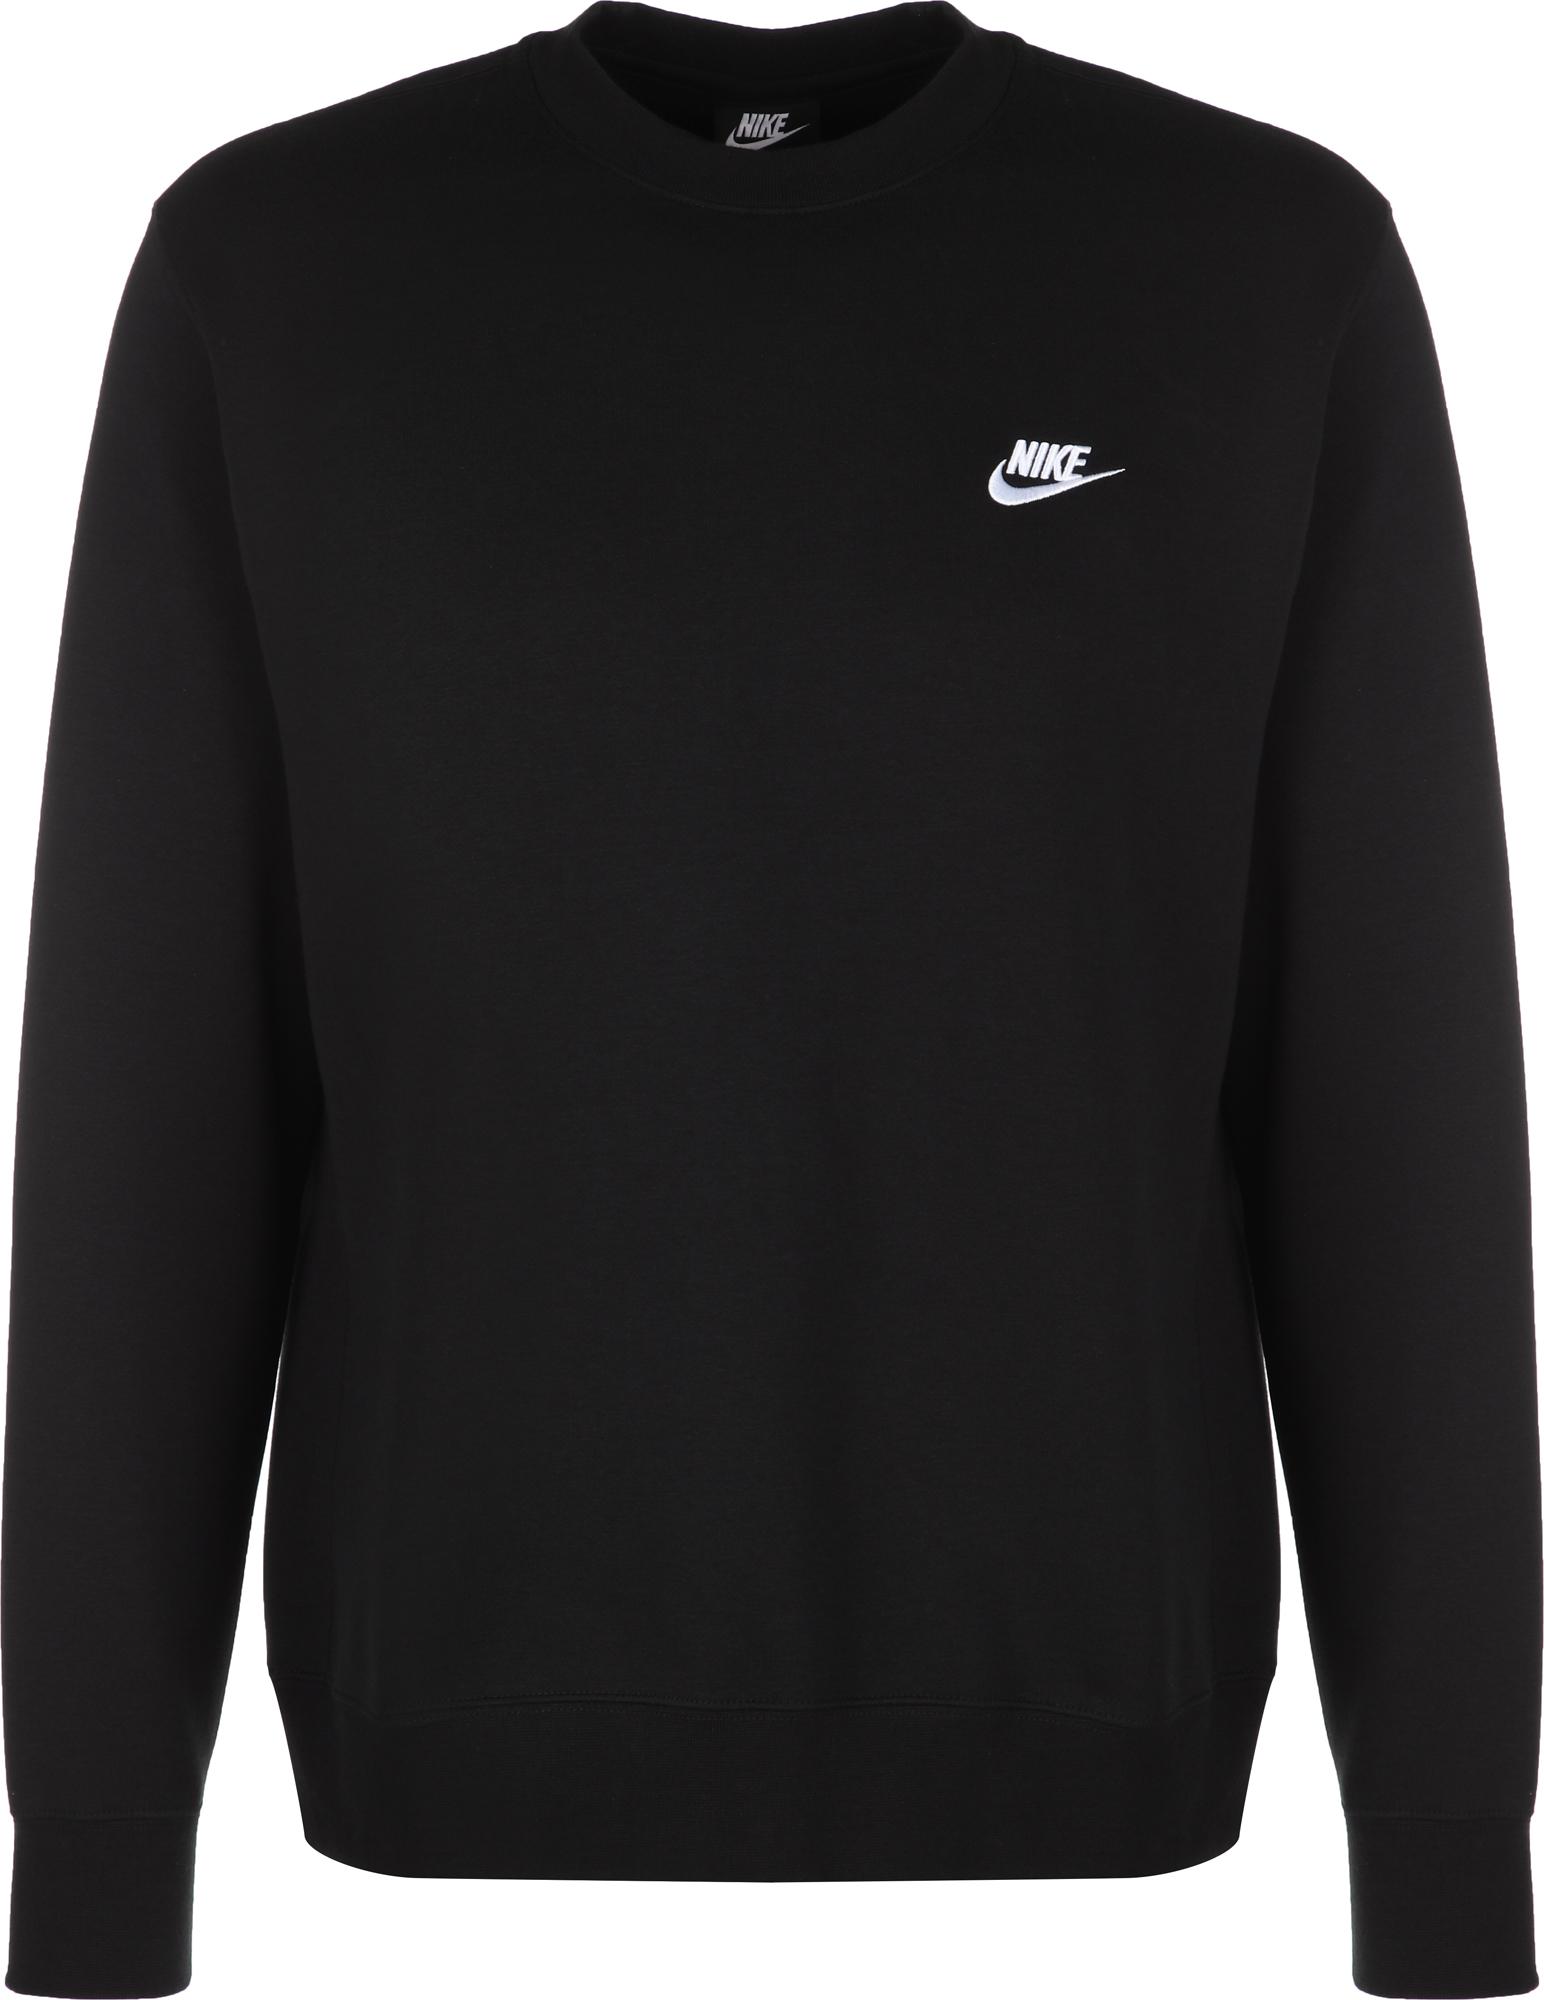 Фото - Nike Свитшот мужской Nike Sportswear Club, размер 54-56 nike свитшот мужской nike sportswear just do it размер 52 54